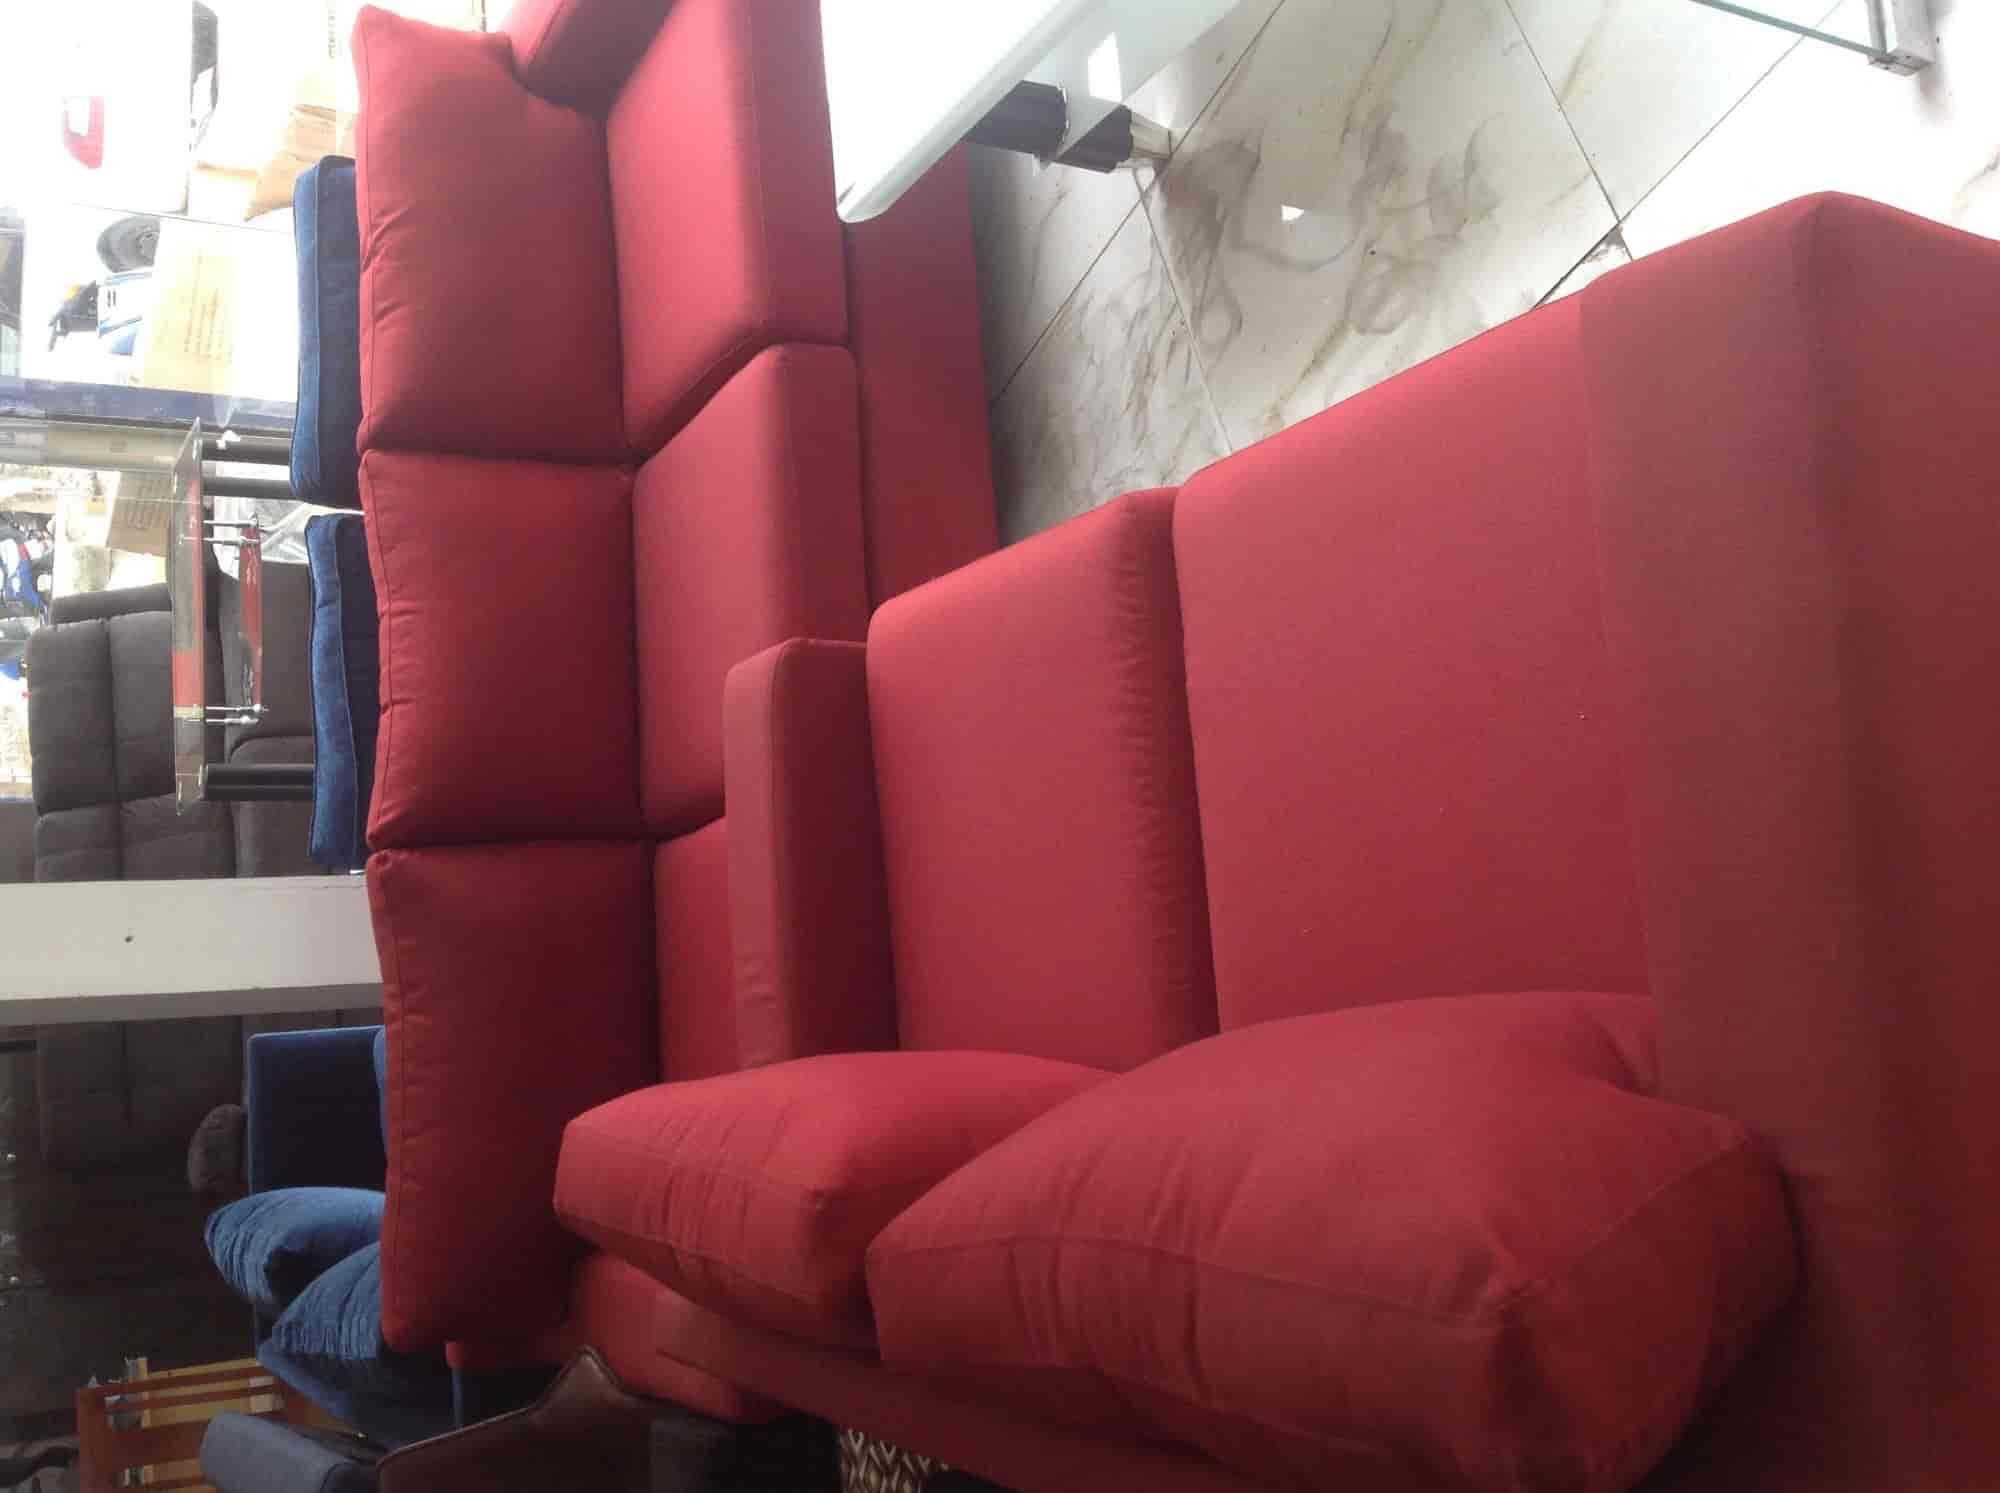 Modern Furniture Jp Nagar 7th Phase Furniture Dealers in